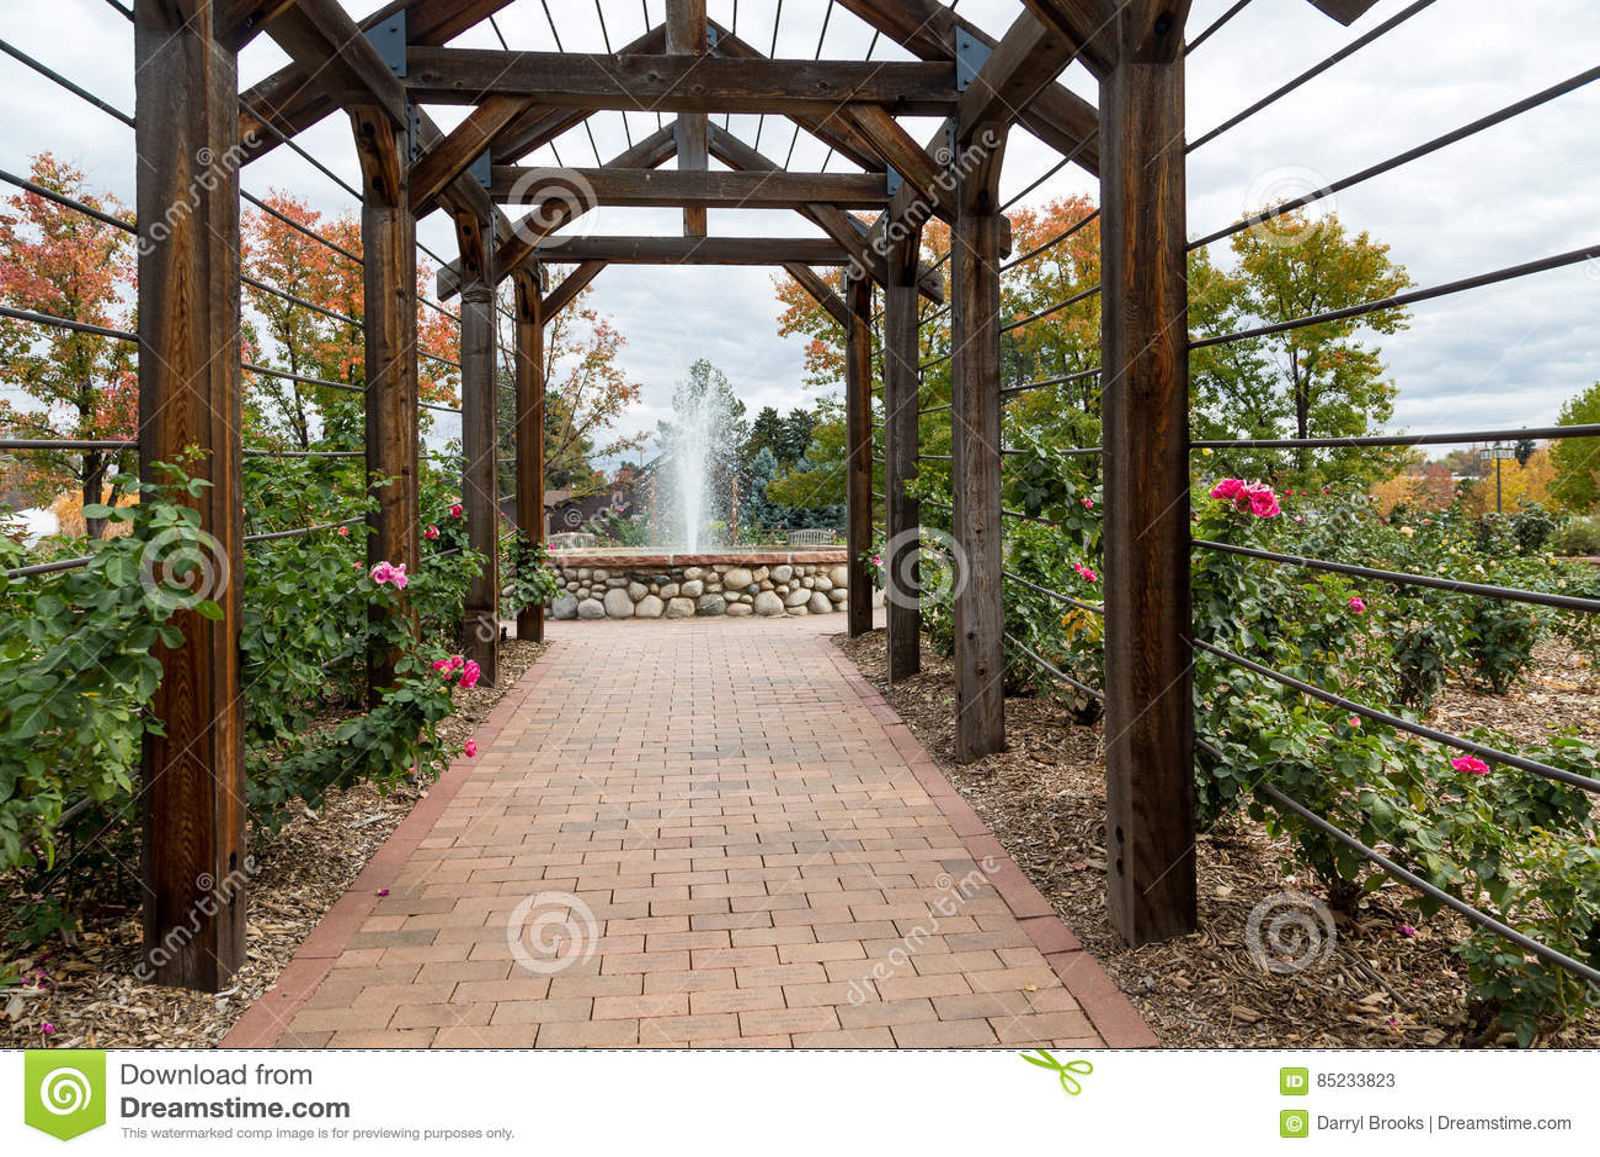 Rick Walkway Under Rose Trellis Stock Image Image Of